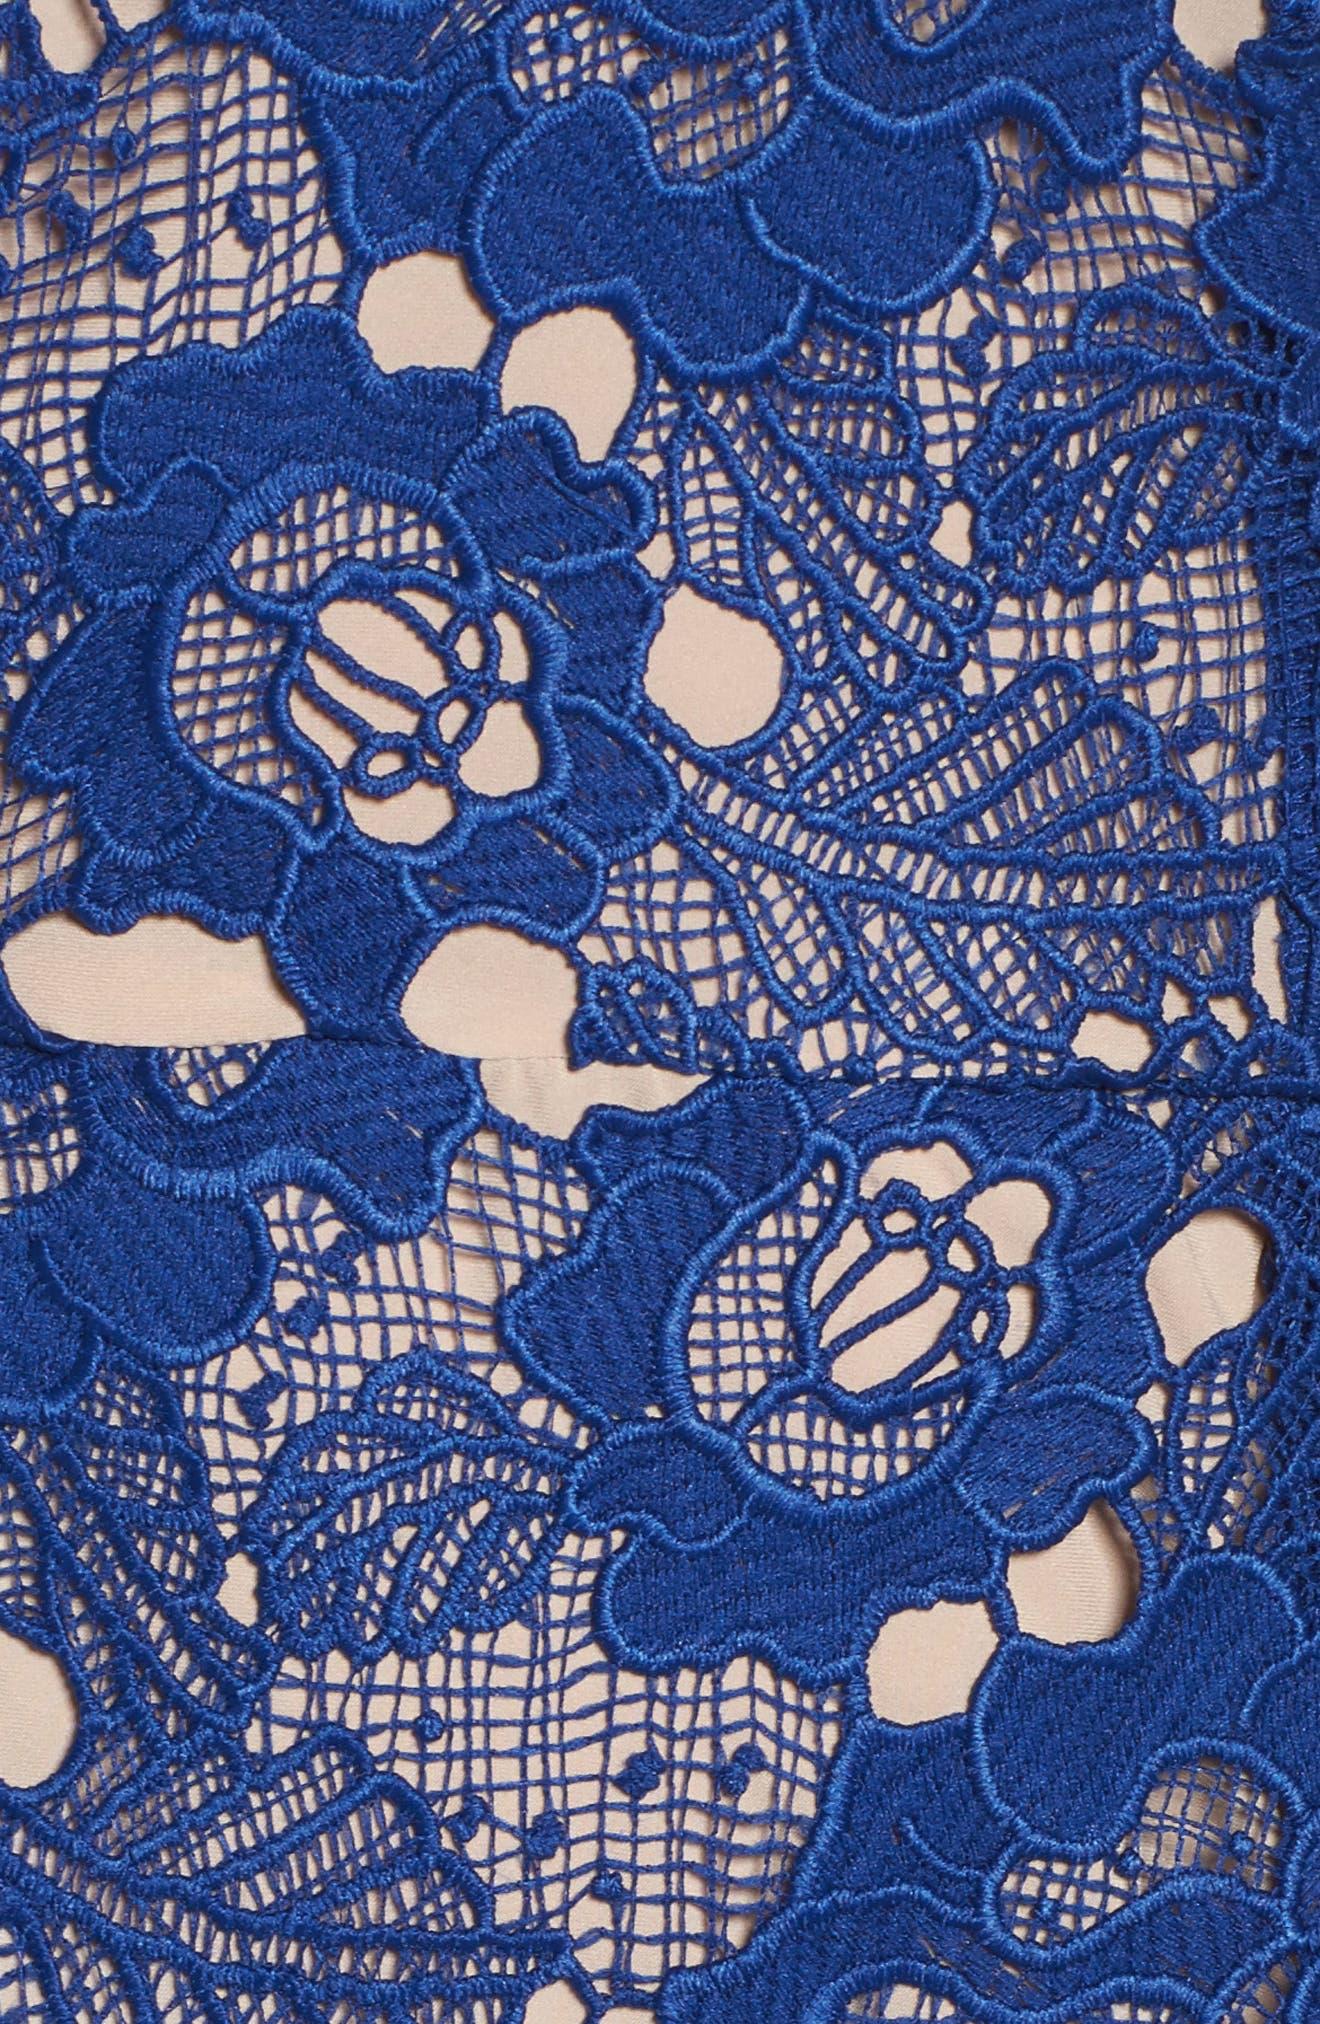 Sky Beauty Lace Ruffle Dress,                             Alternate thumbnail 5, color,                             Catalina Blue